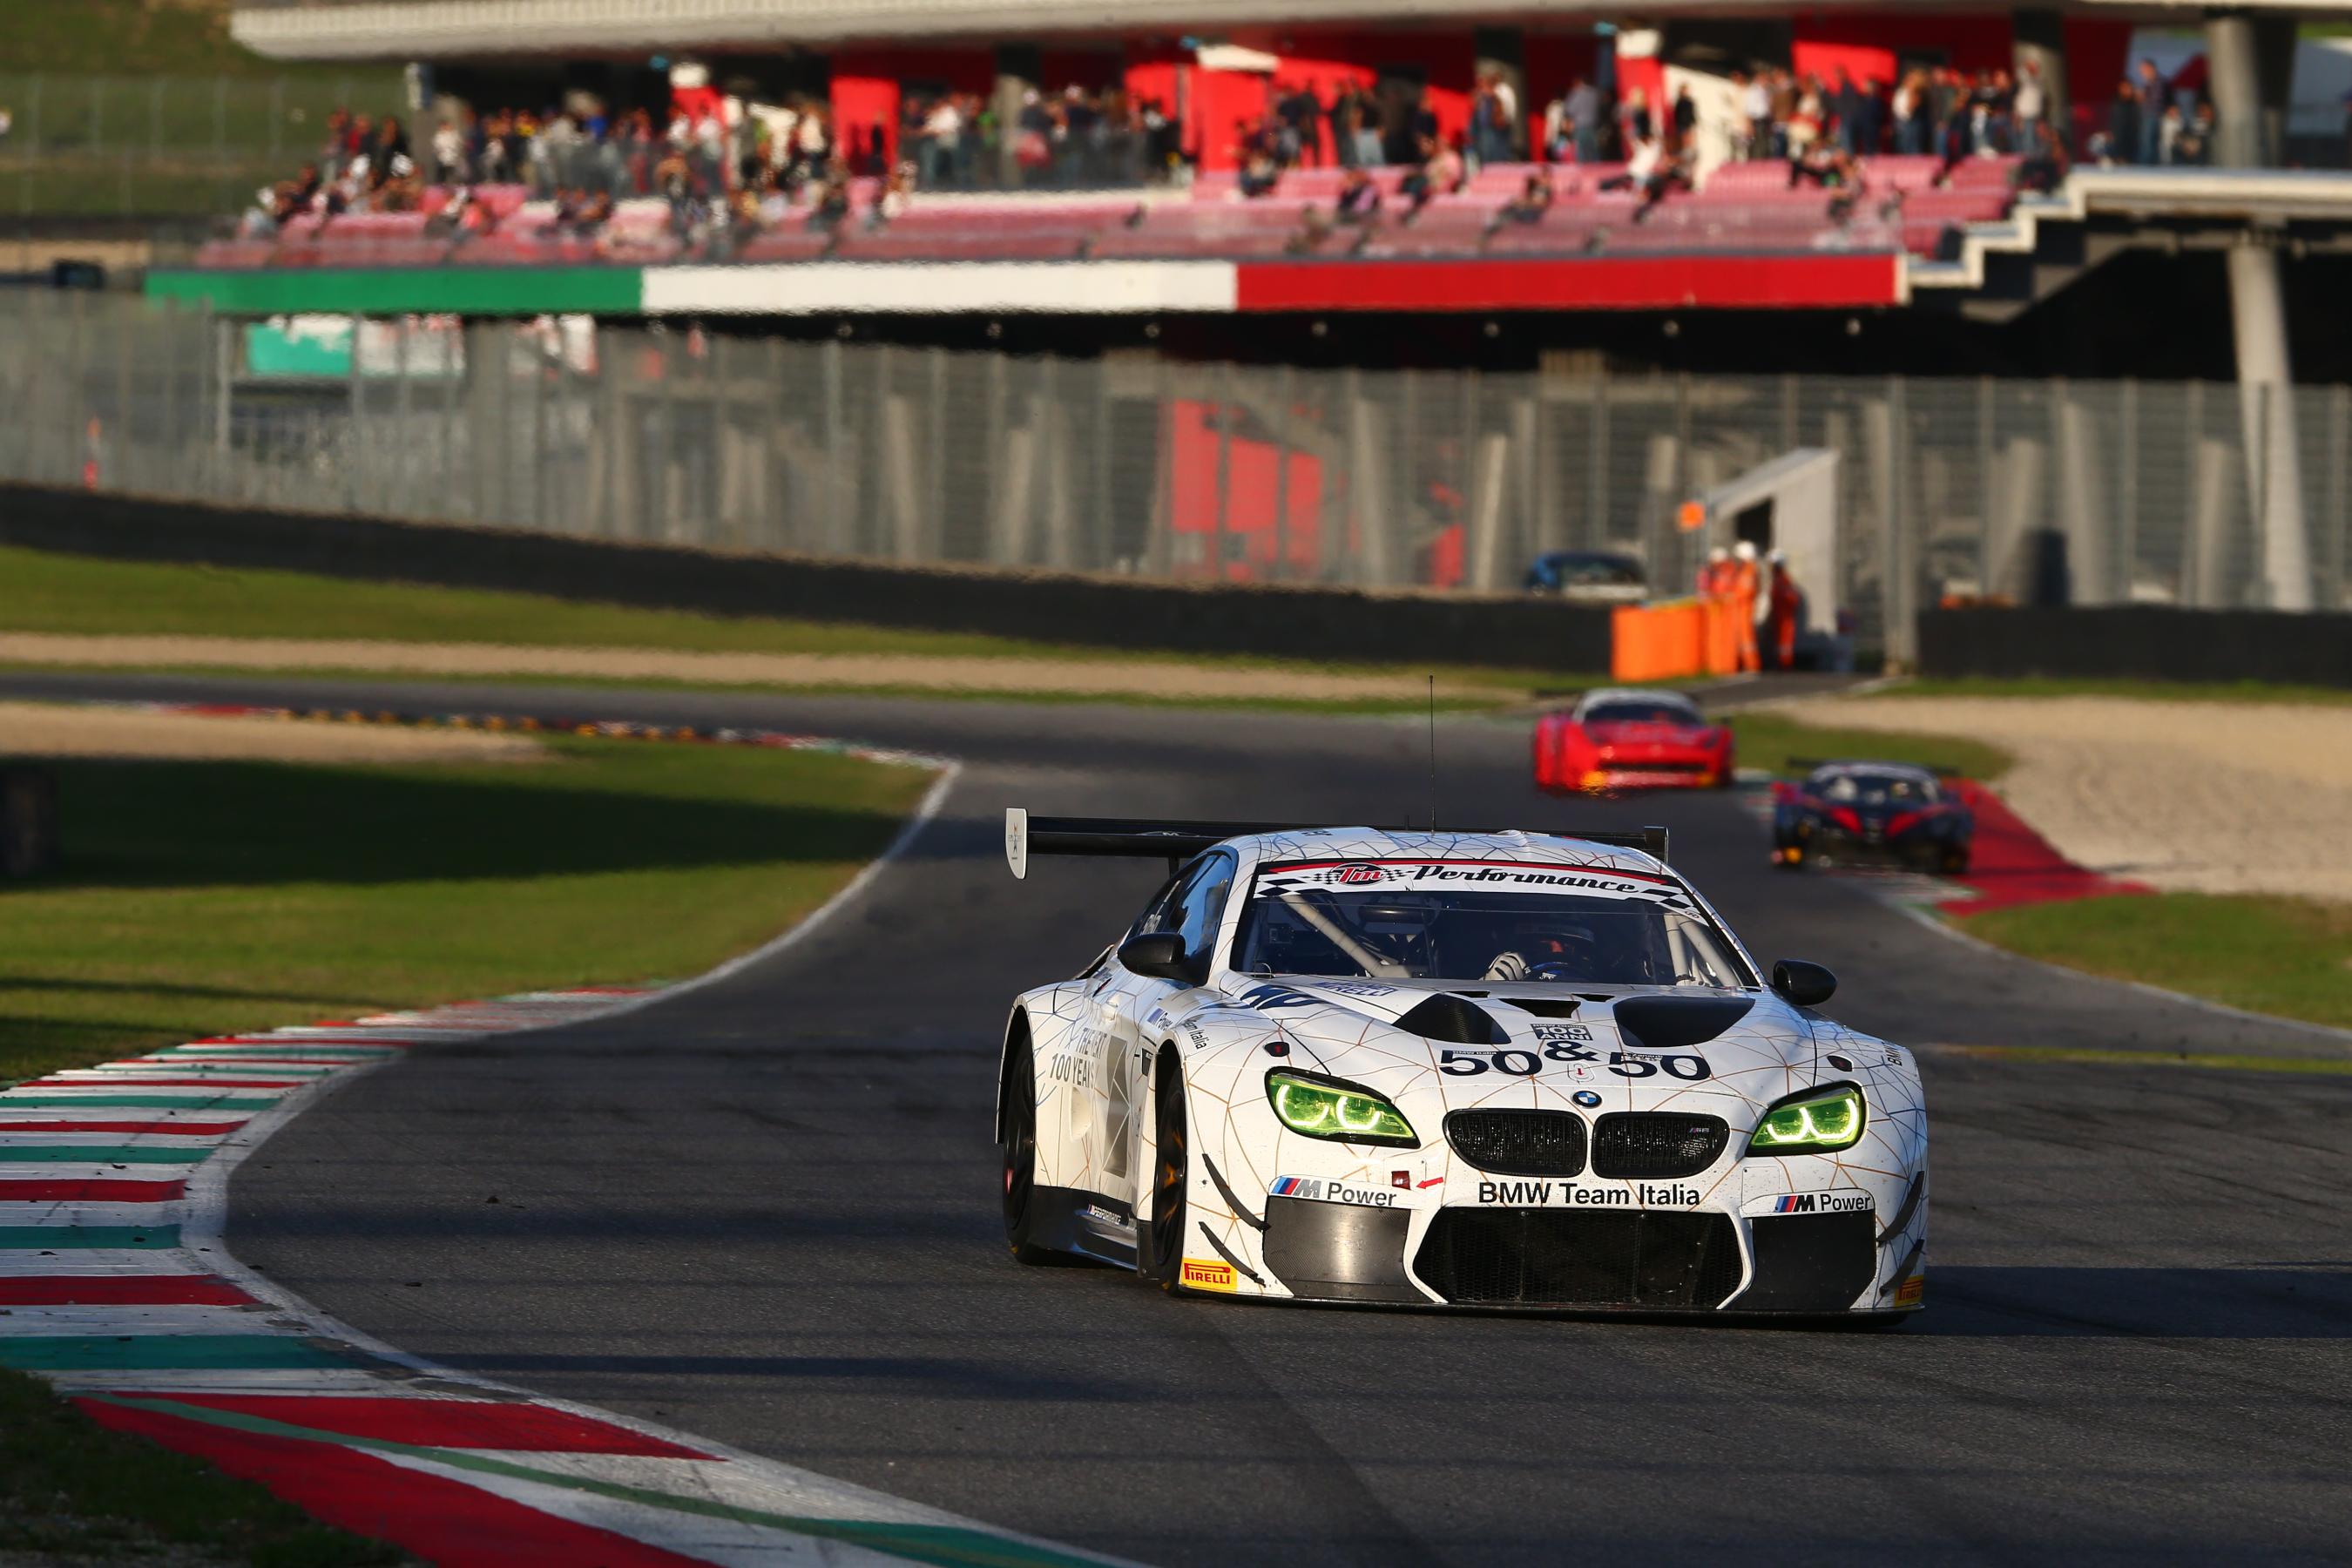 Alex Zanardi - Campionato Italiano GT (Mugello 2016) - BMW M6 GT3 - BMW Team Italia